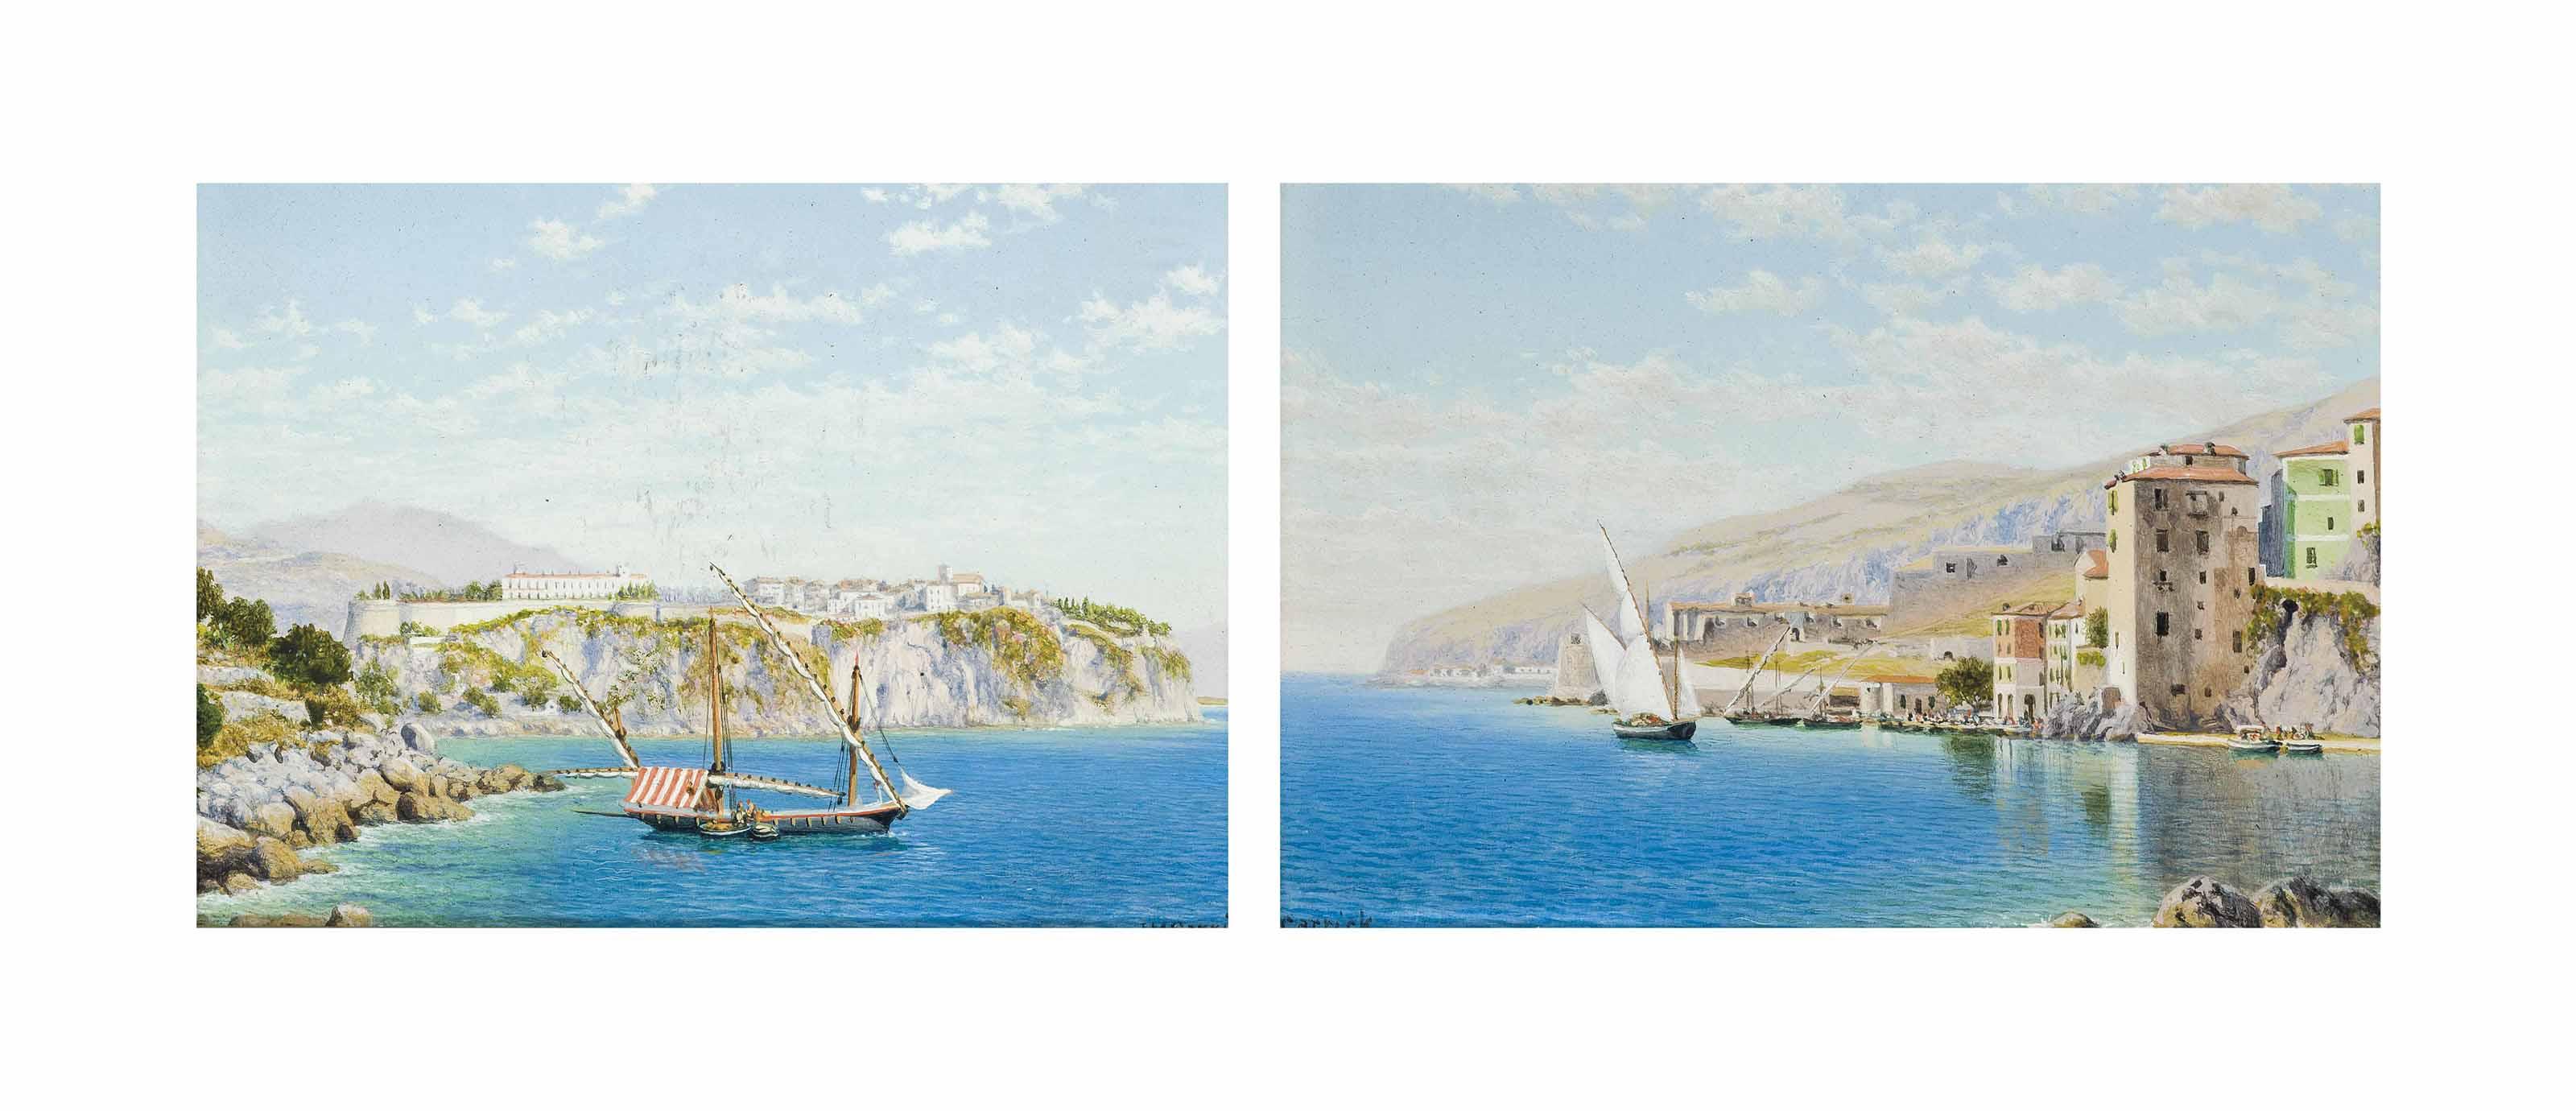 Fishermen off a rocky coastline, Italy; and The Italian Riveria